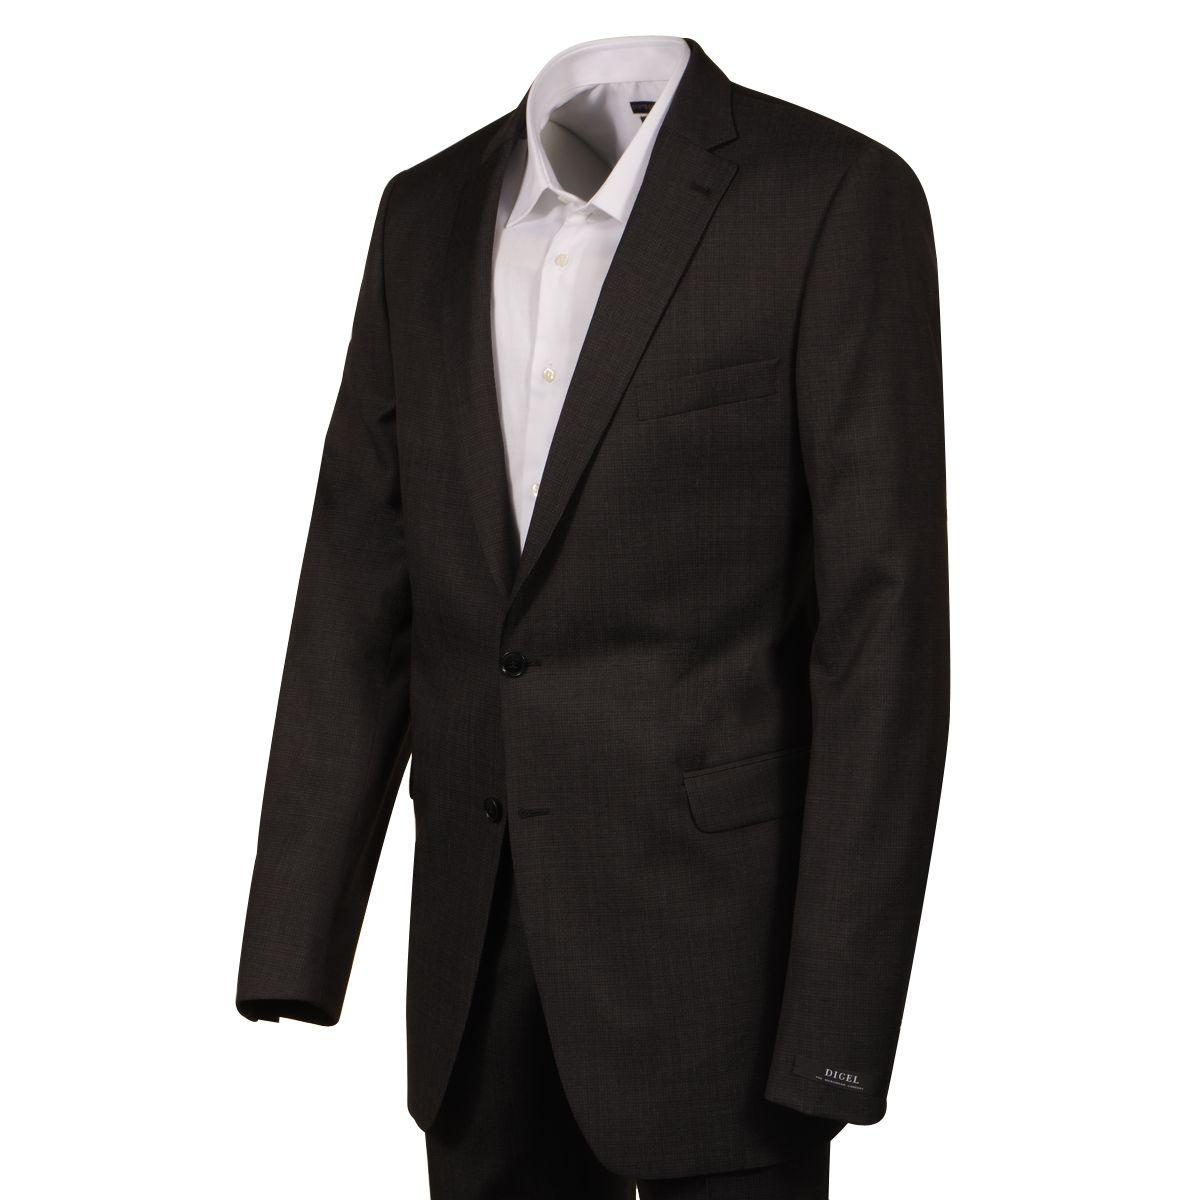 costume gris anthracite pour homme grand size factory picture car interior design. Black Bedroom Furniture Sets. Home Design Ideas